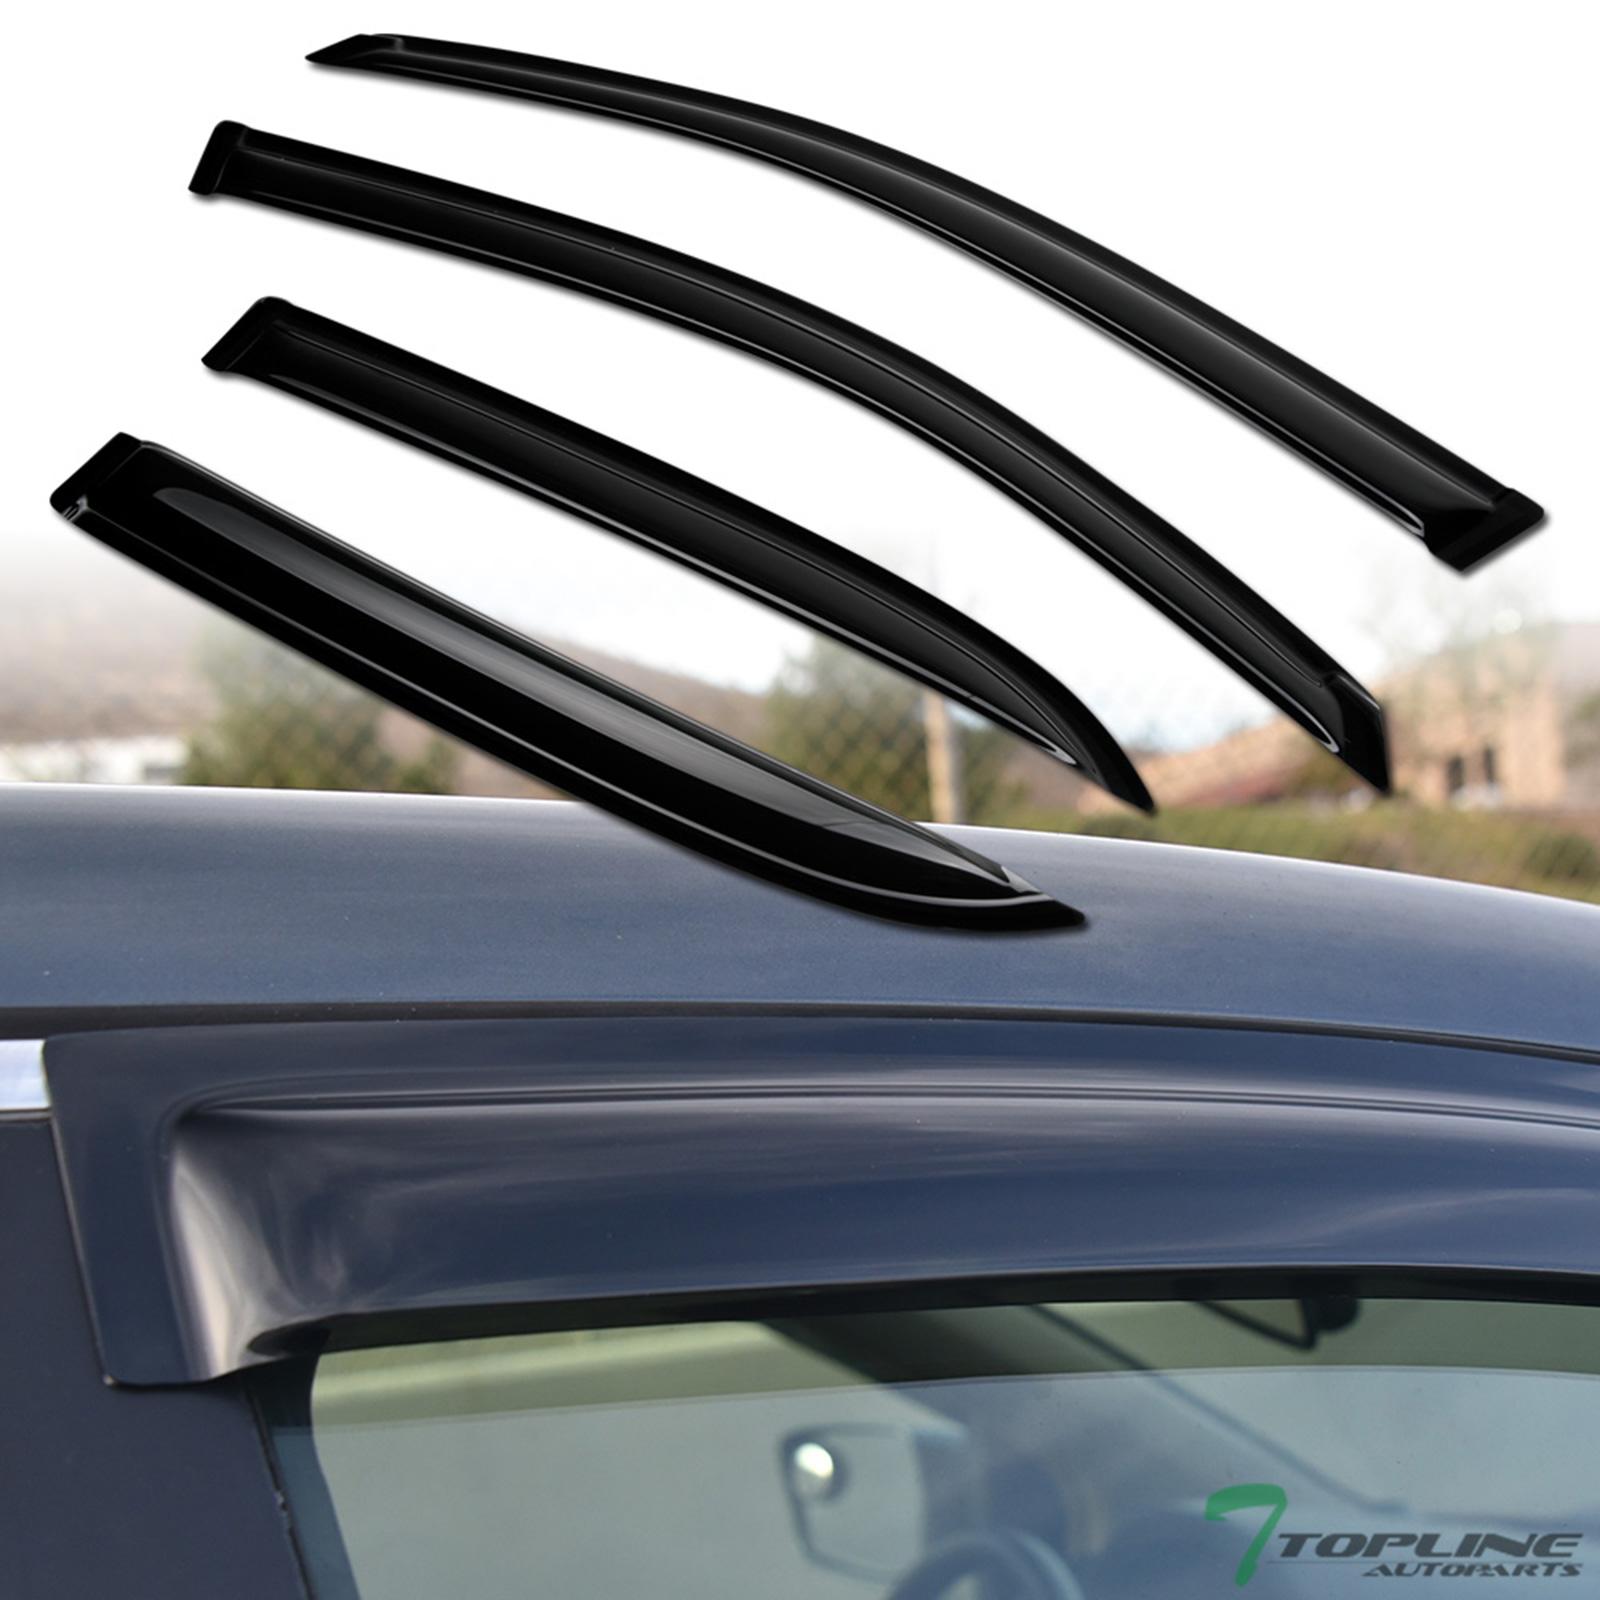 Topline For 2005-2012 Nissan Pathfinder Sun Rain Guard Vent Shade Window Visors